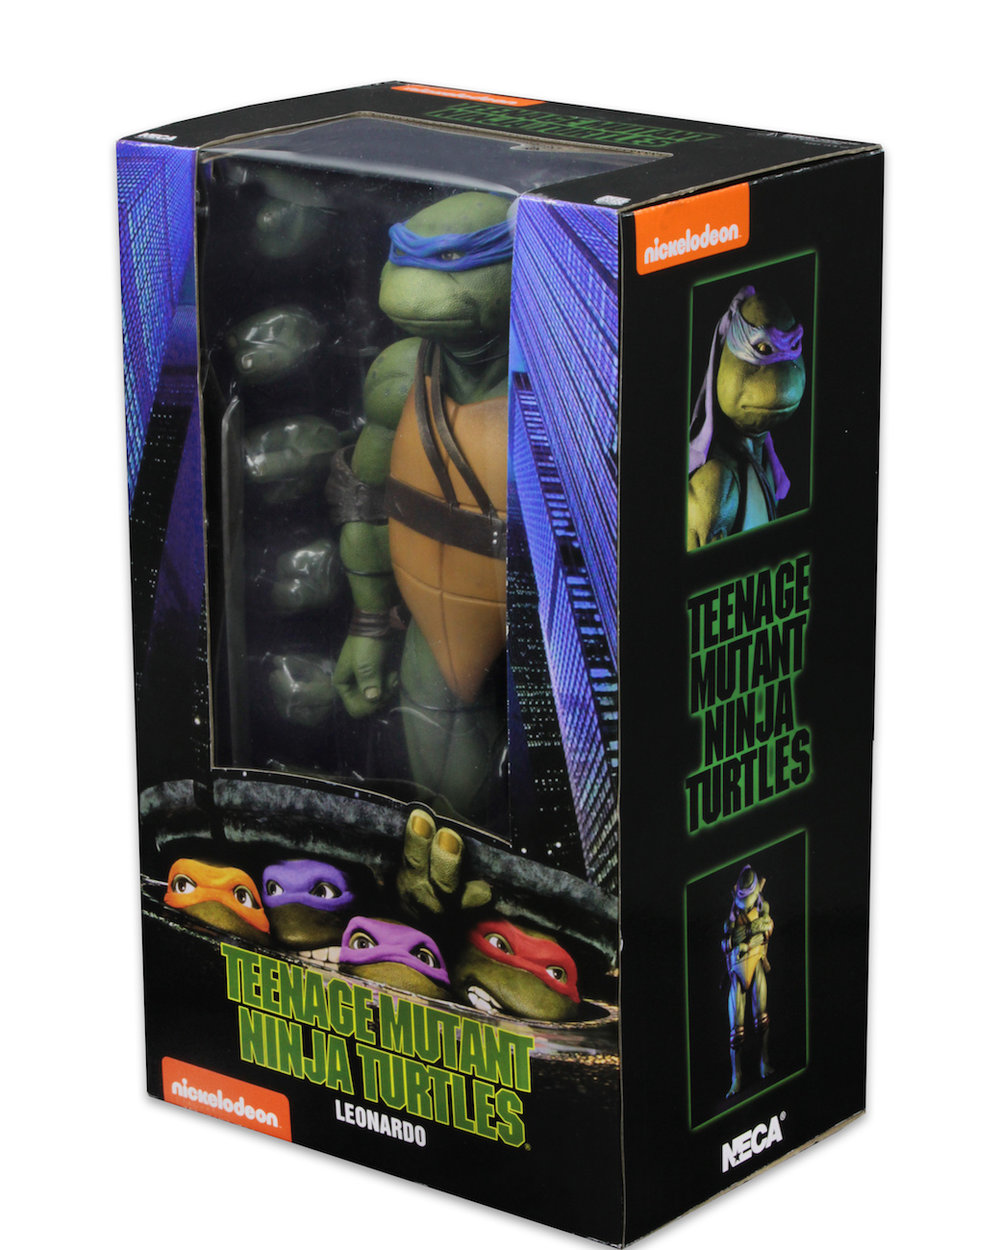 NECA-TMNT-1990-box-05.jpg